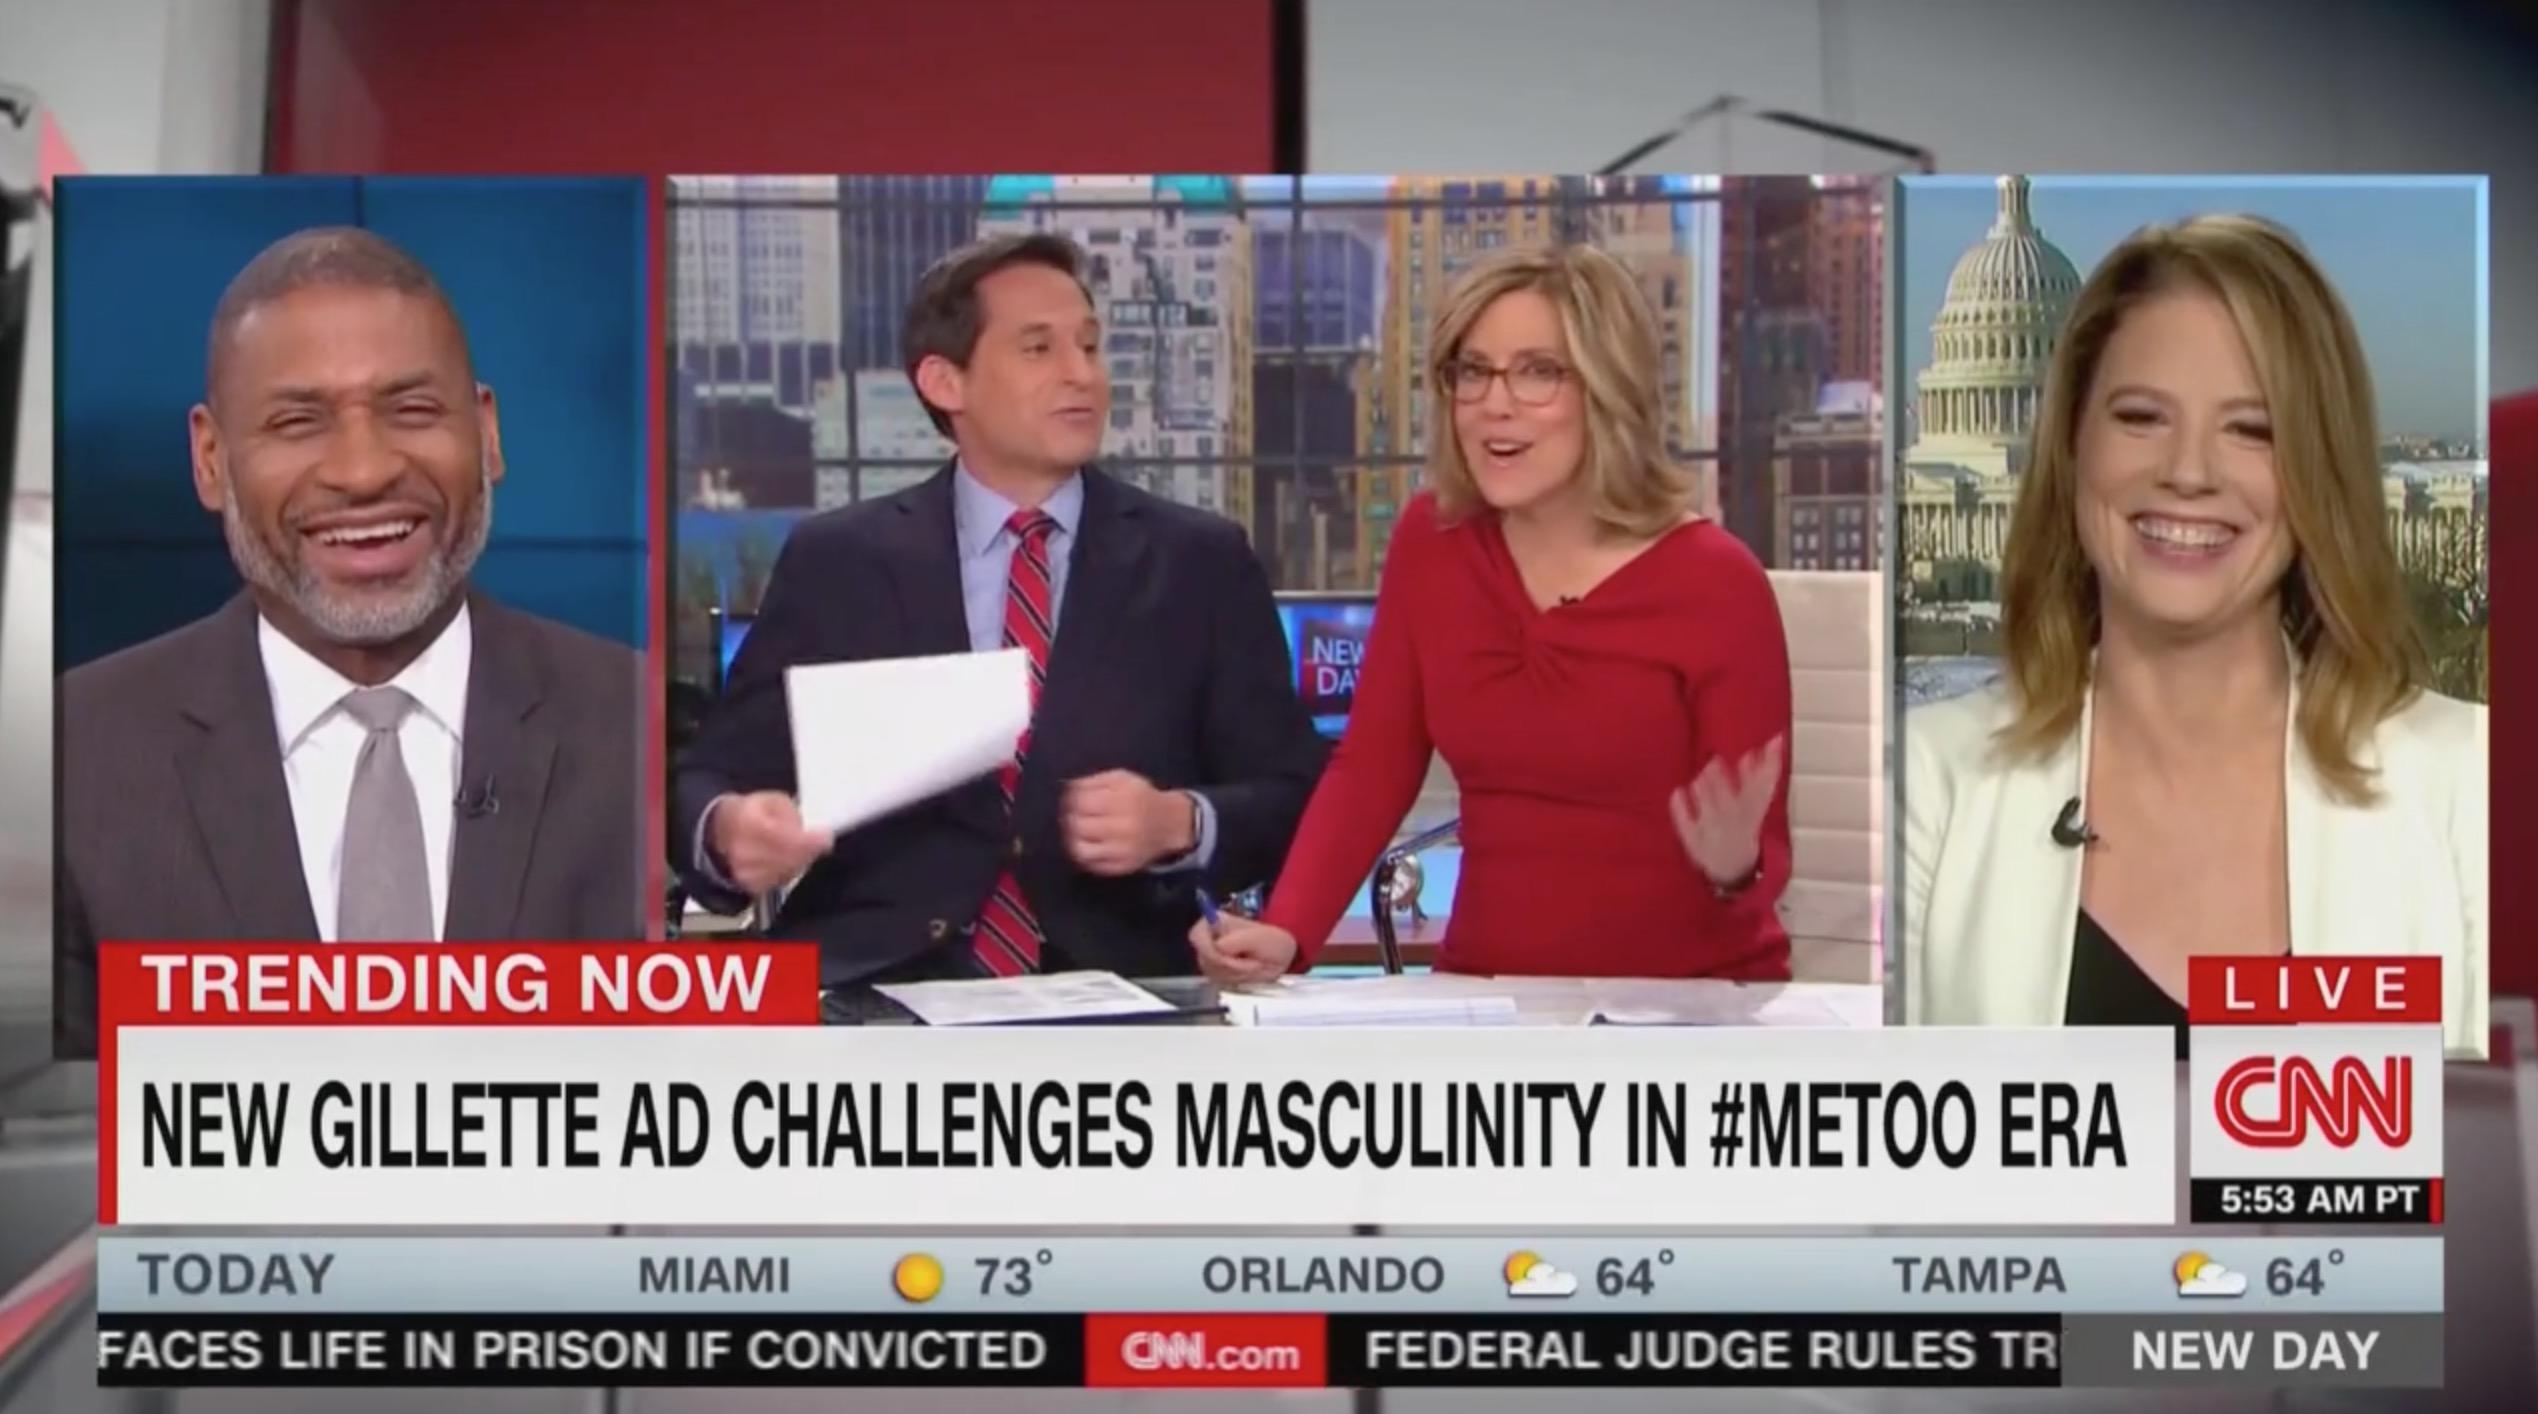 CNN's John Berman, Alisyn Camerota Hilariously Go Off the